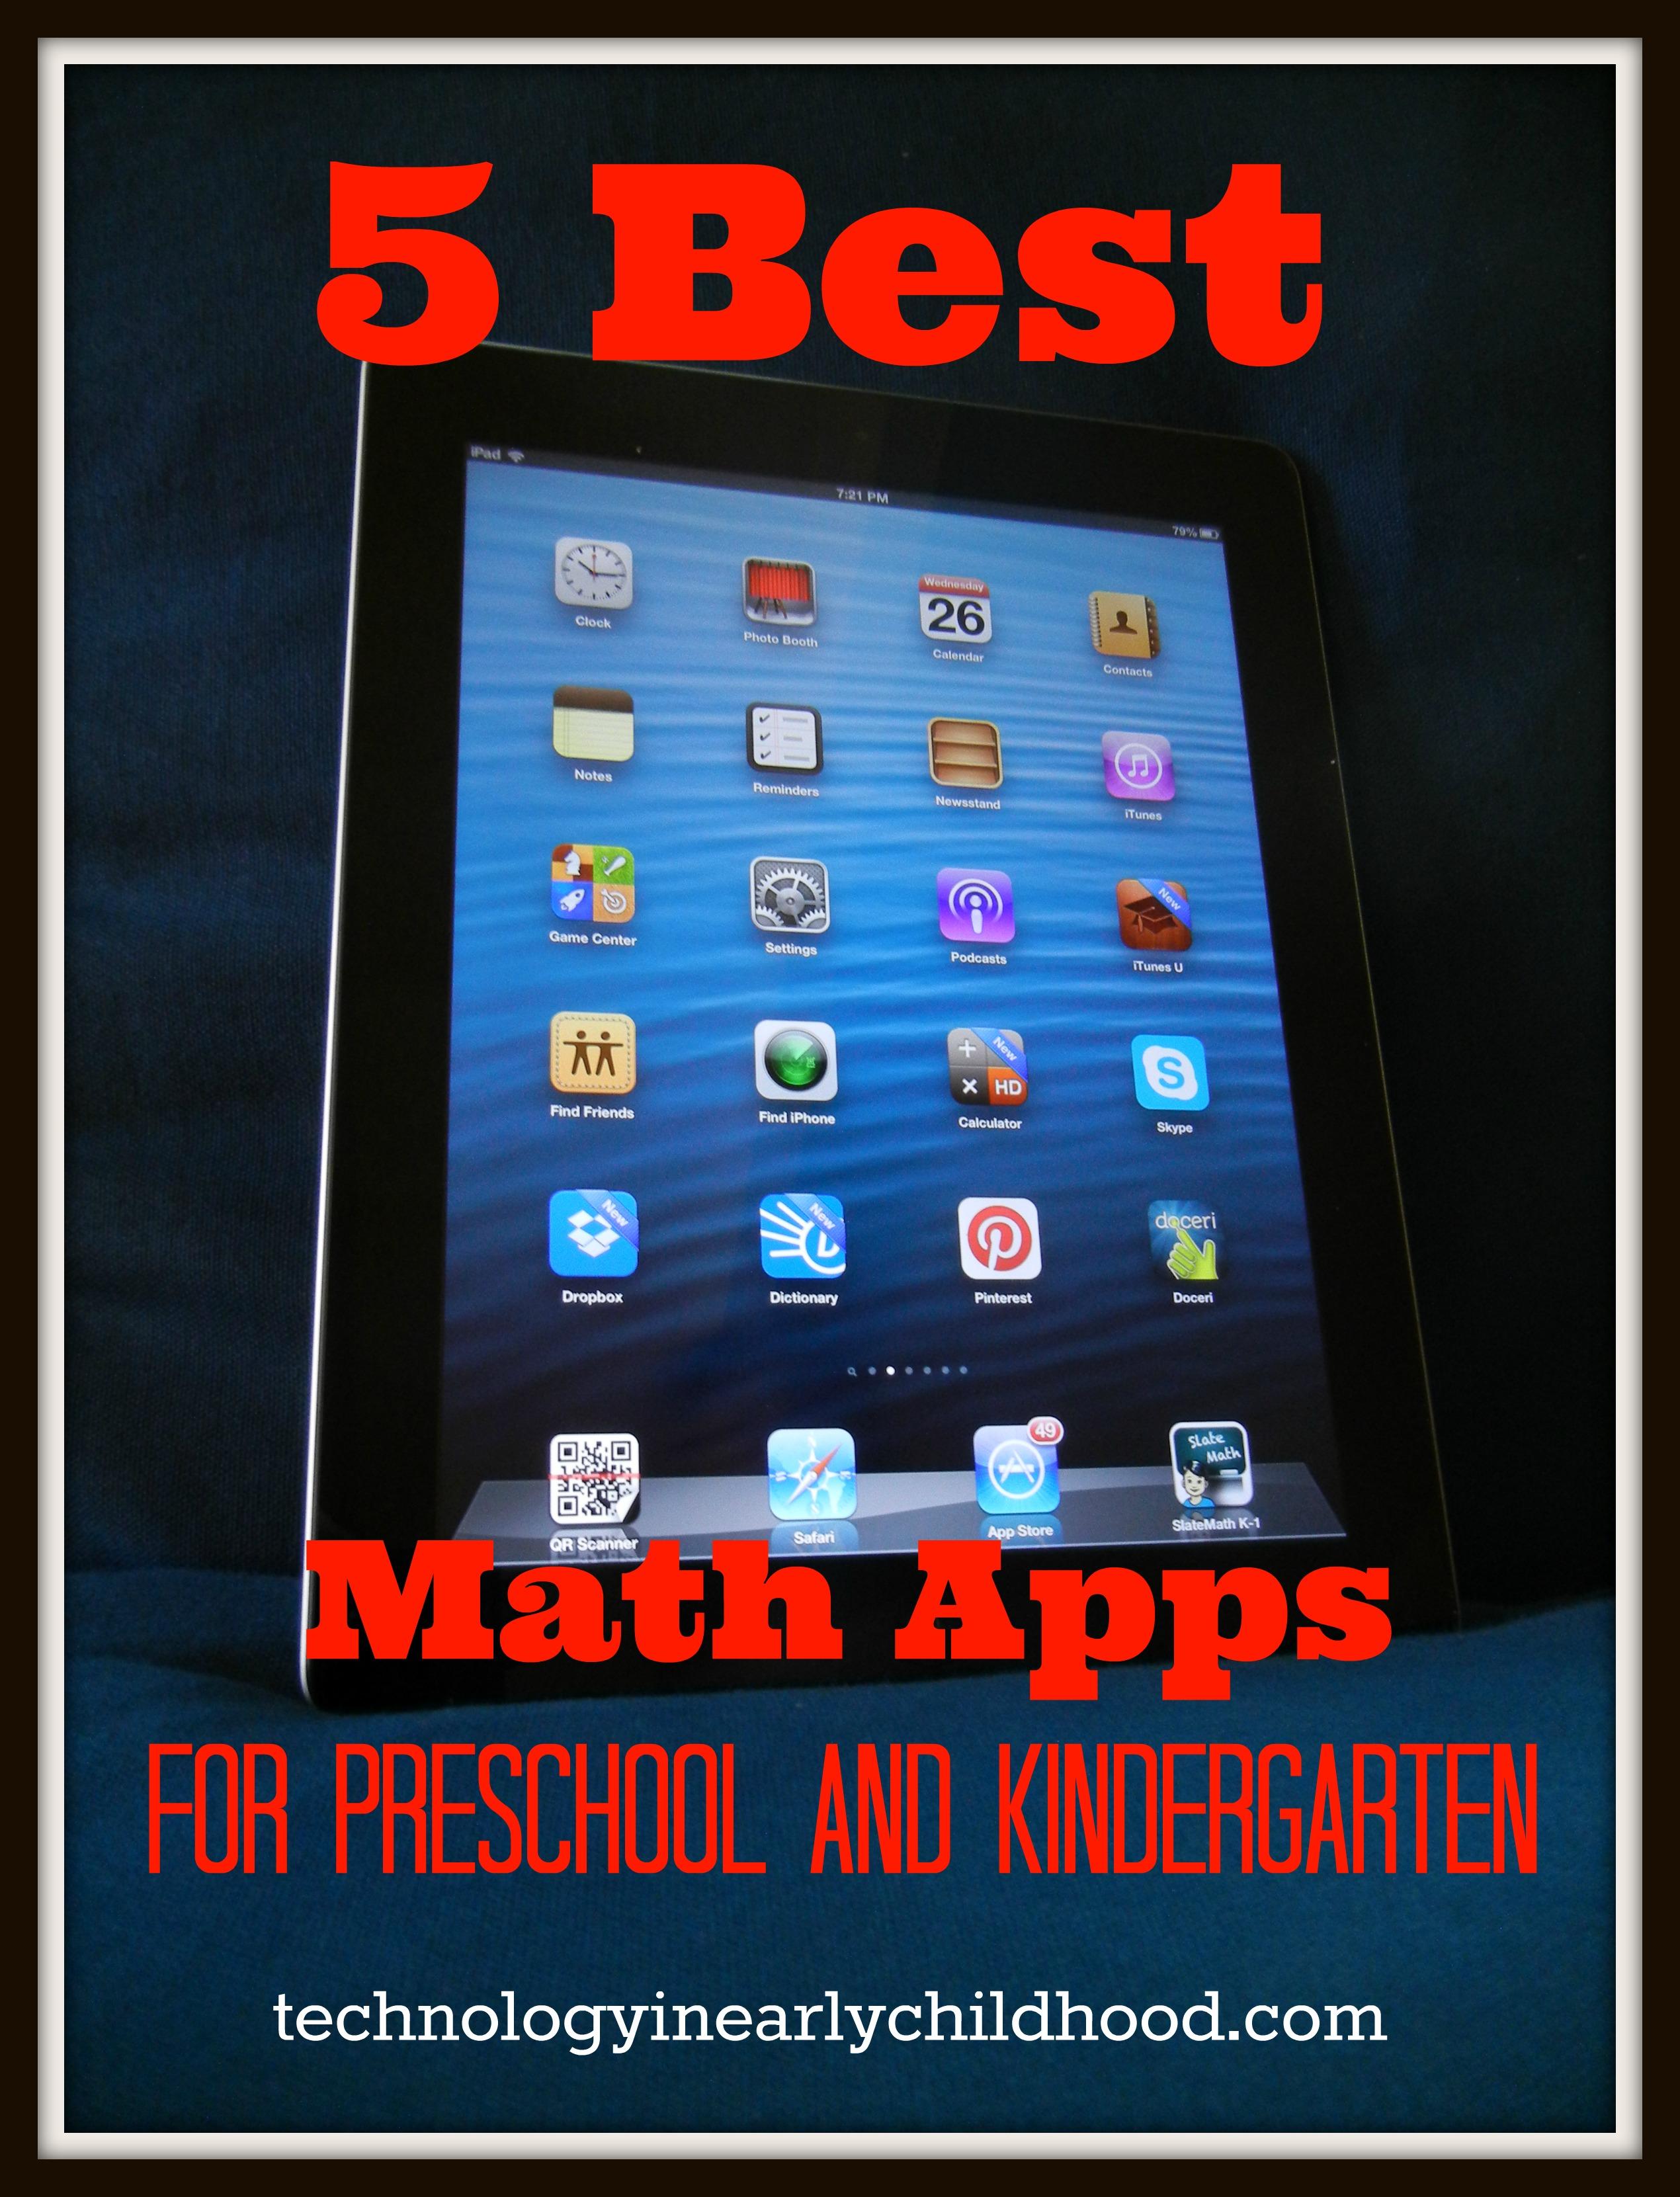 5 Best Math Apps for PreK K - Best Math Apps For Kindergarten